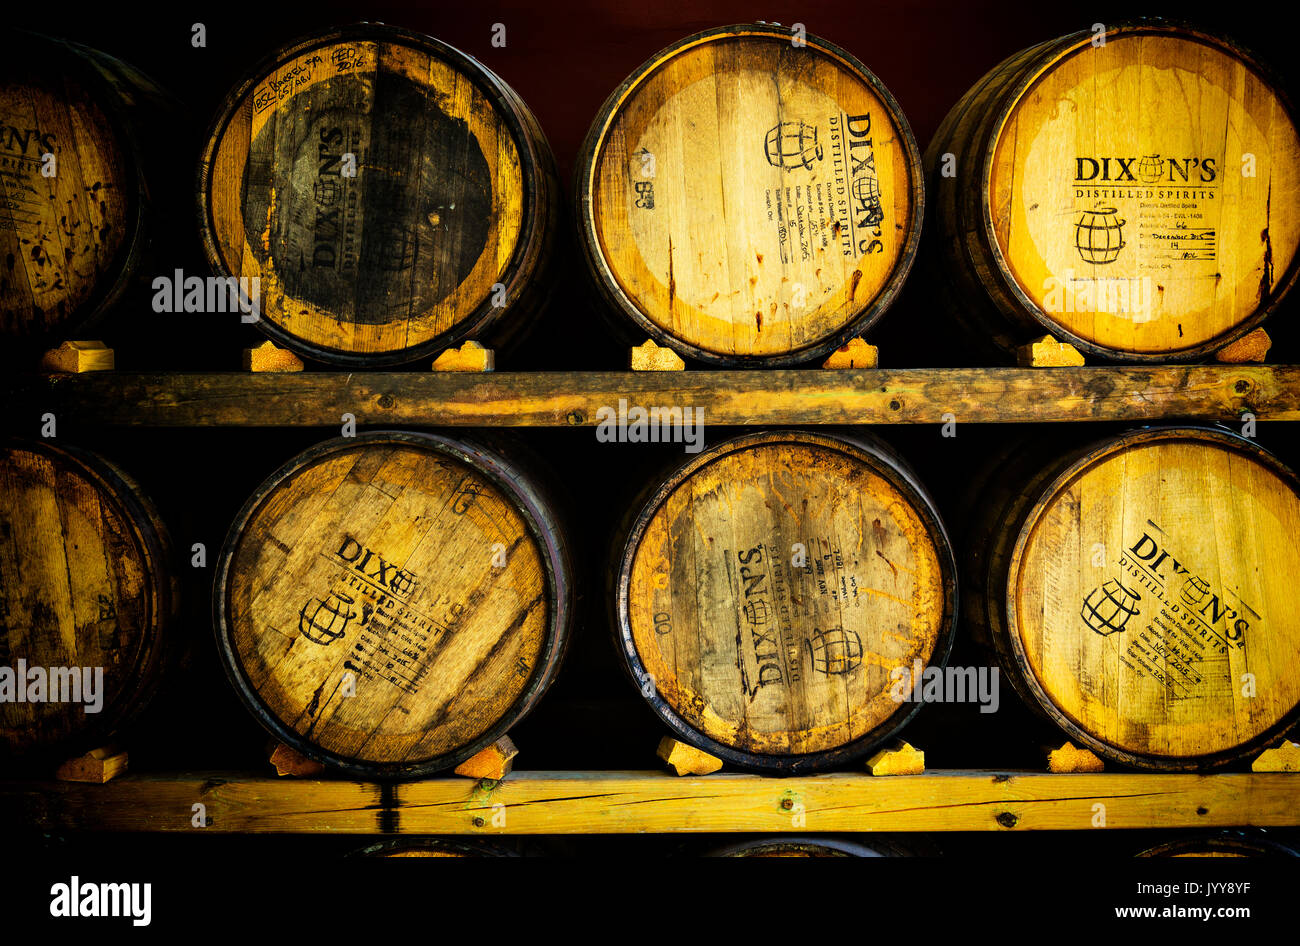 Oak wood aging Barrels in Distillery. Dixons Distilled Spirits Guelph Ontario Canada - Stock Image